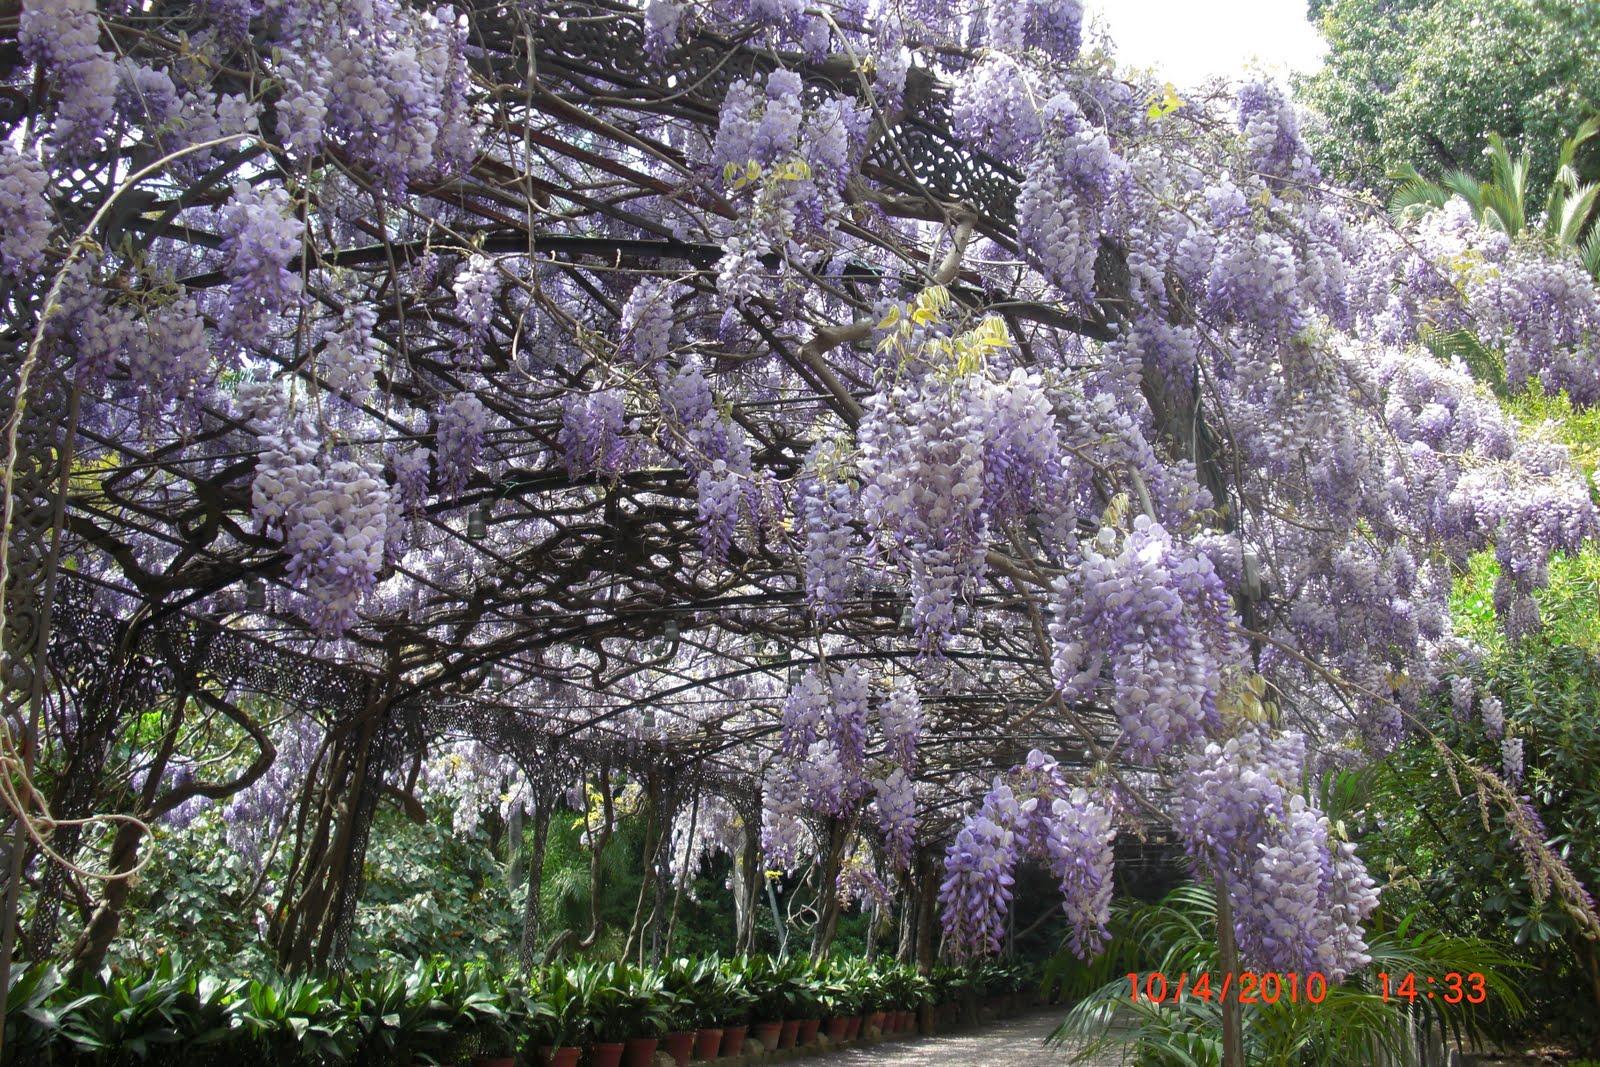 Nuestra m laga jard n bot nico la concepci n for Jardin botanico de malaga